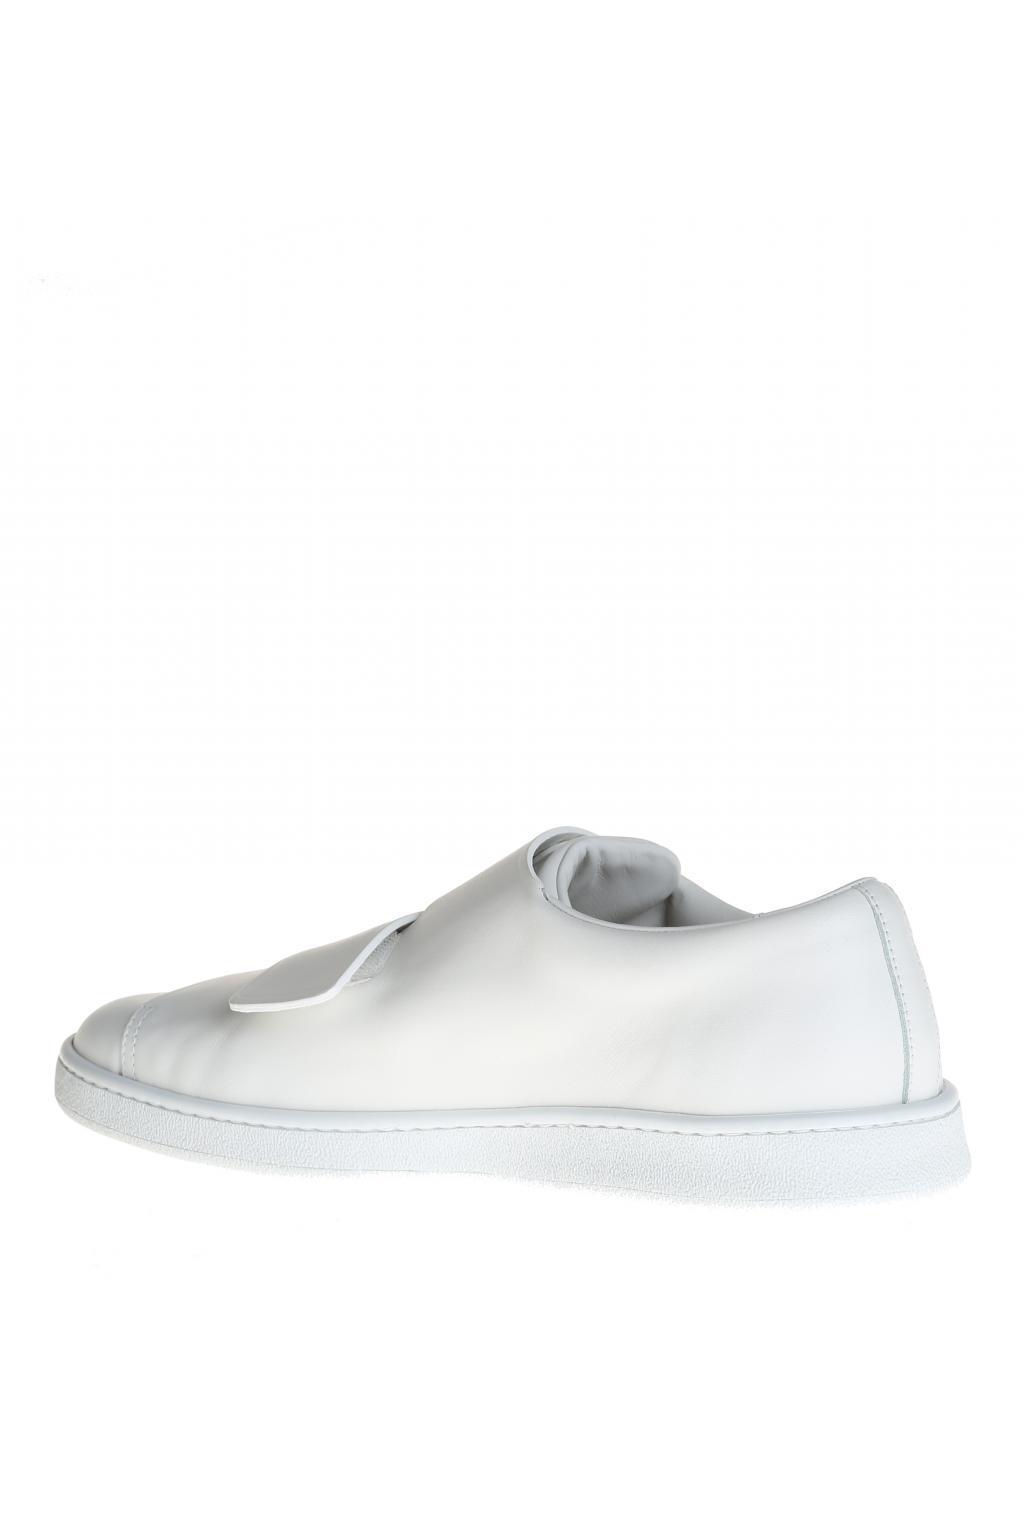 Acne Studios Leather Velcro Sneakers in White